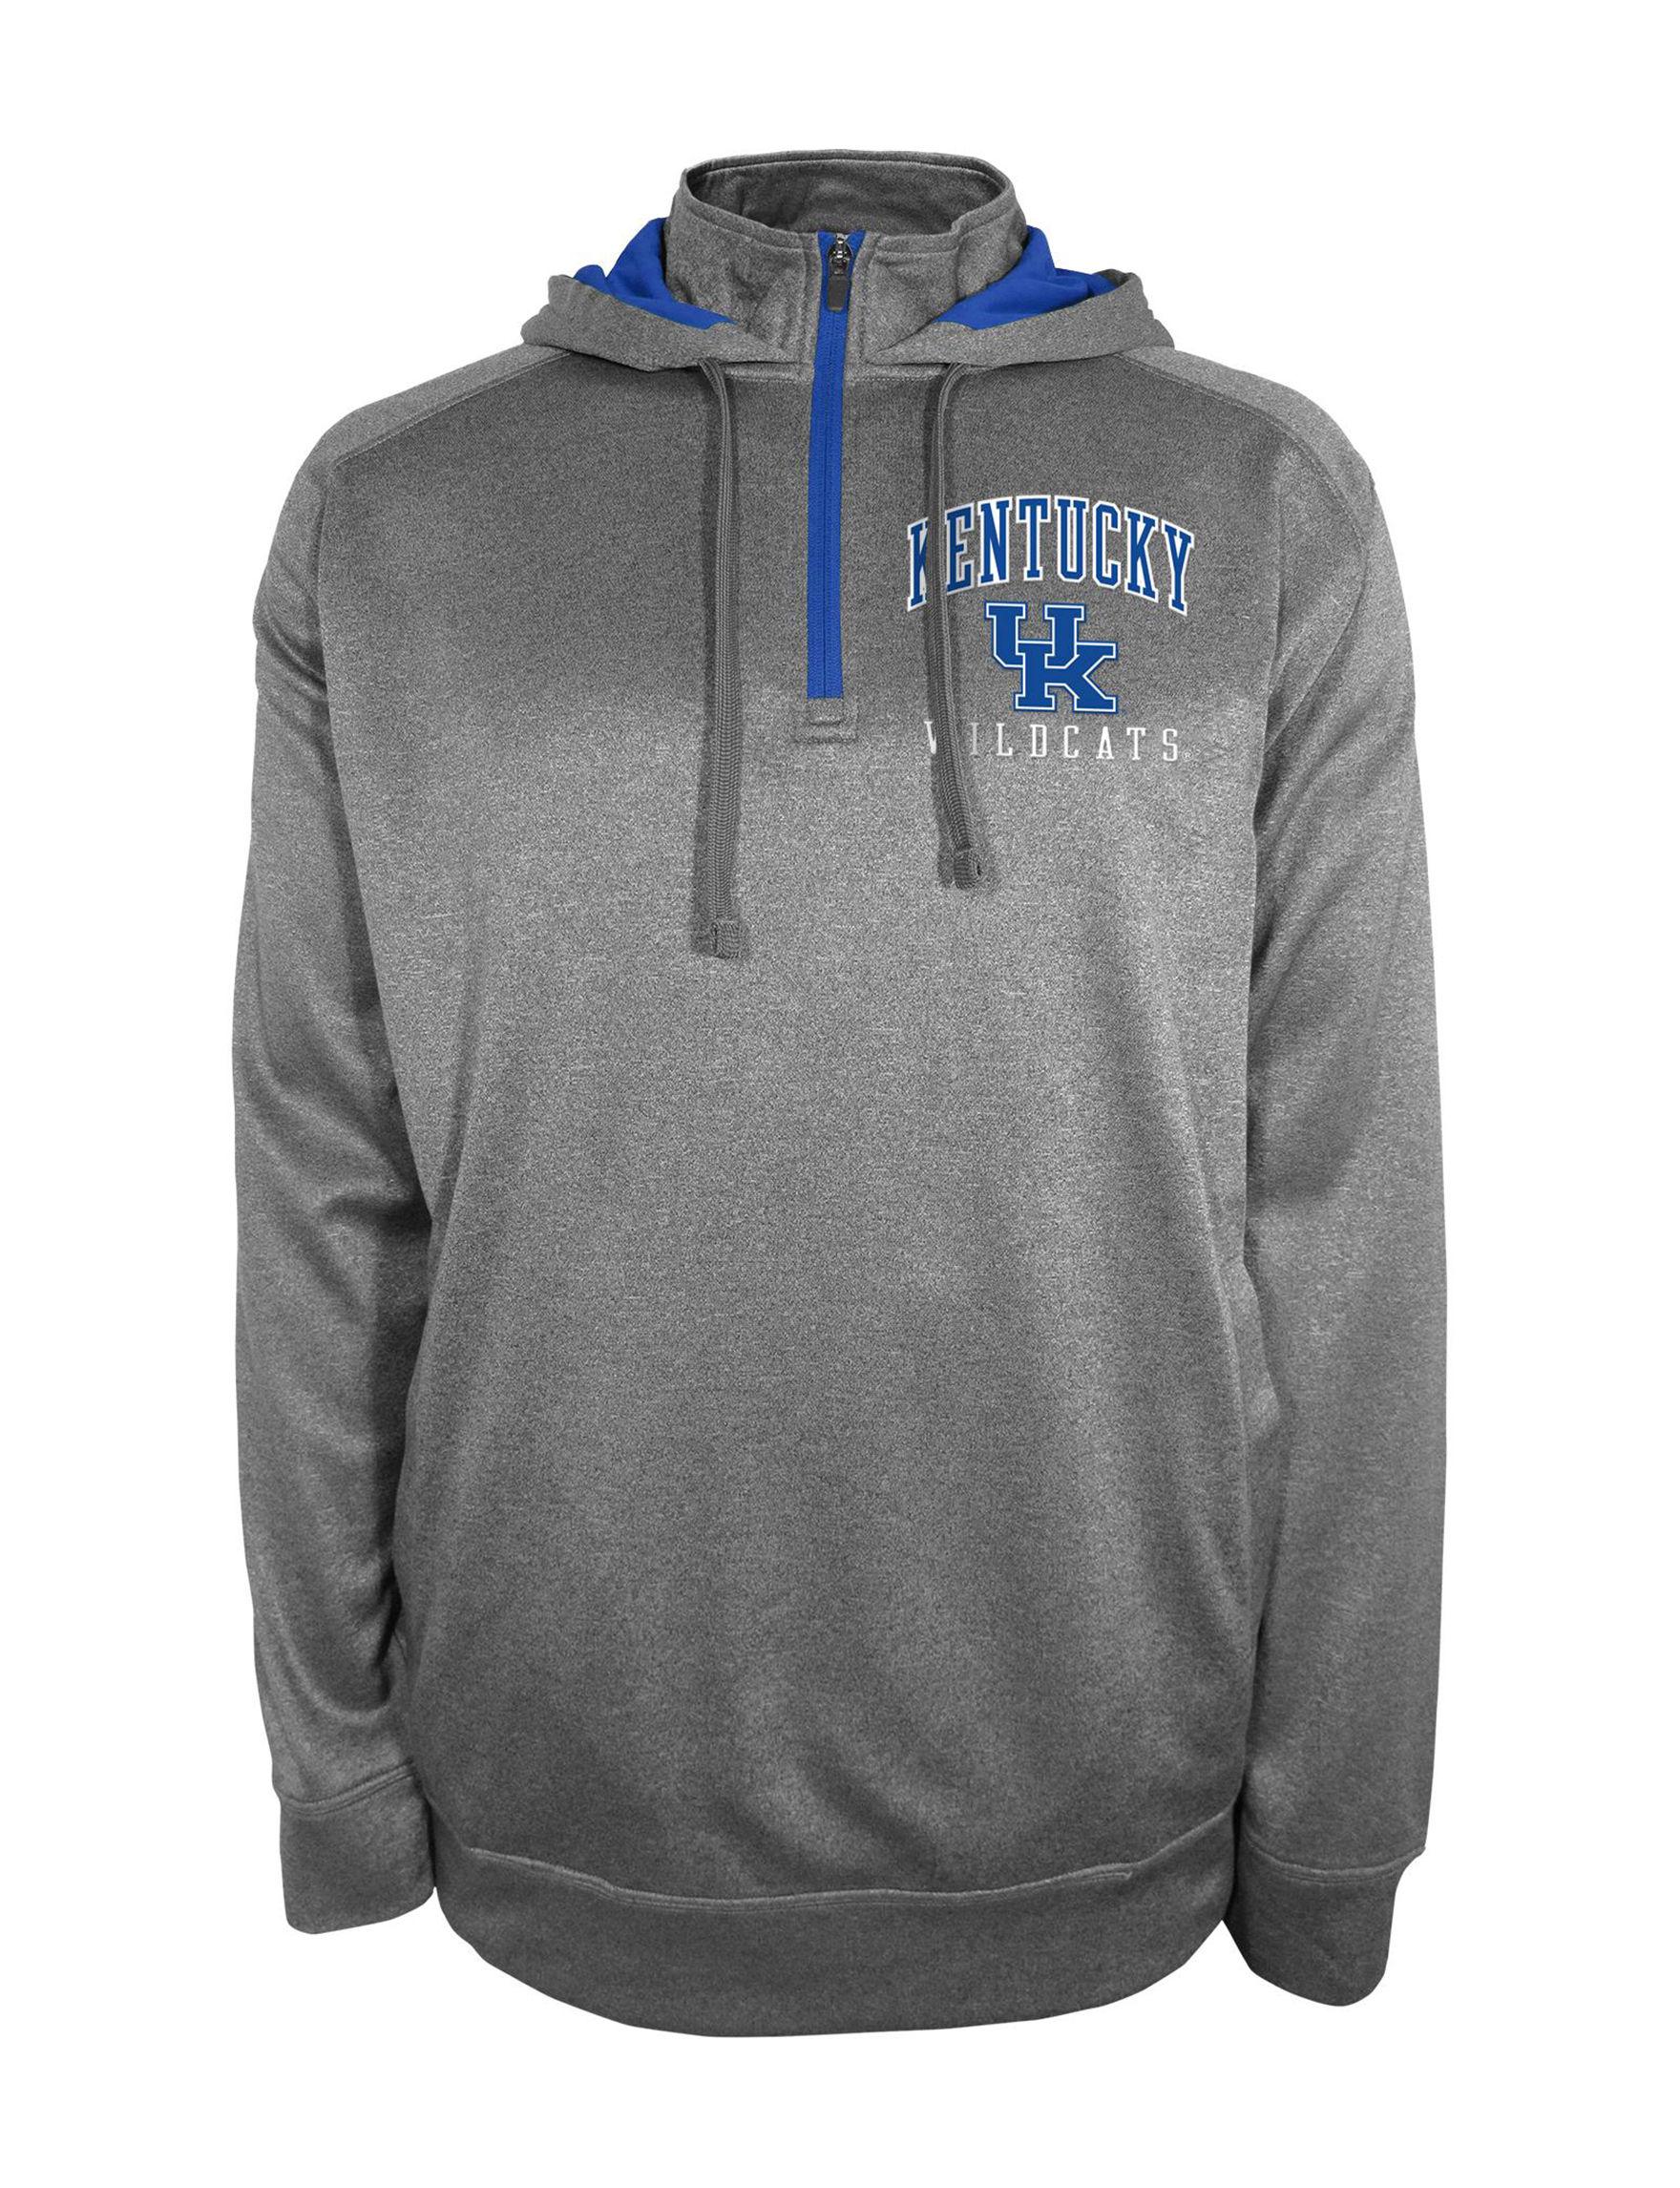 University of kentucky hoodie